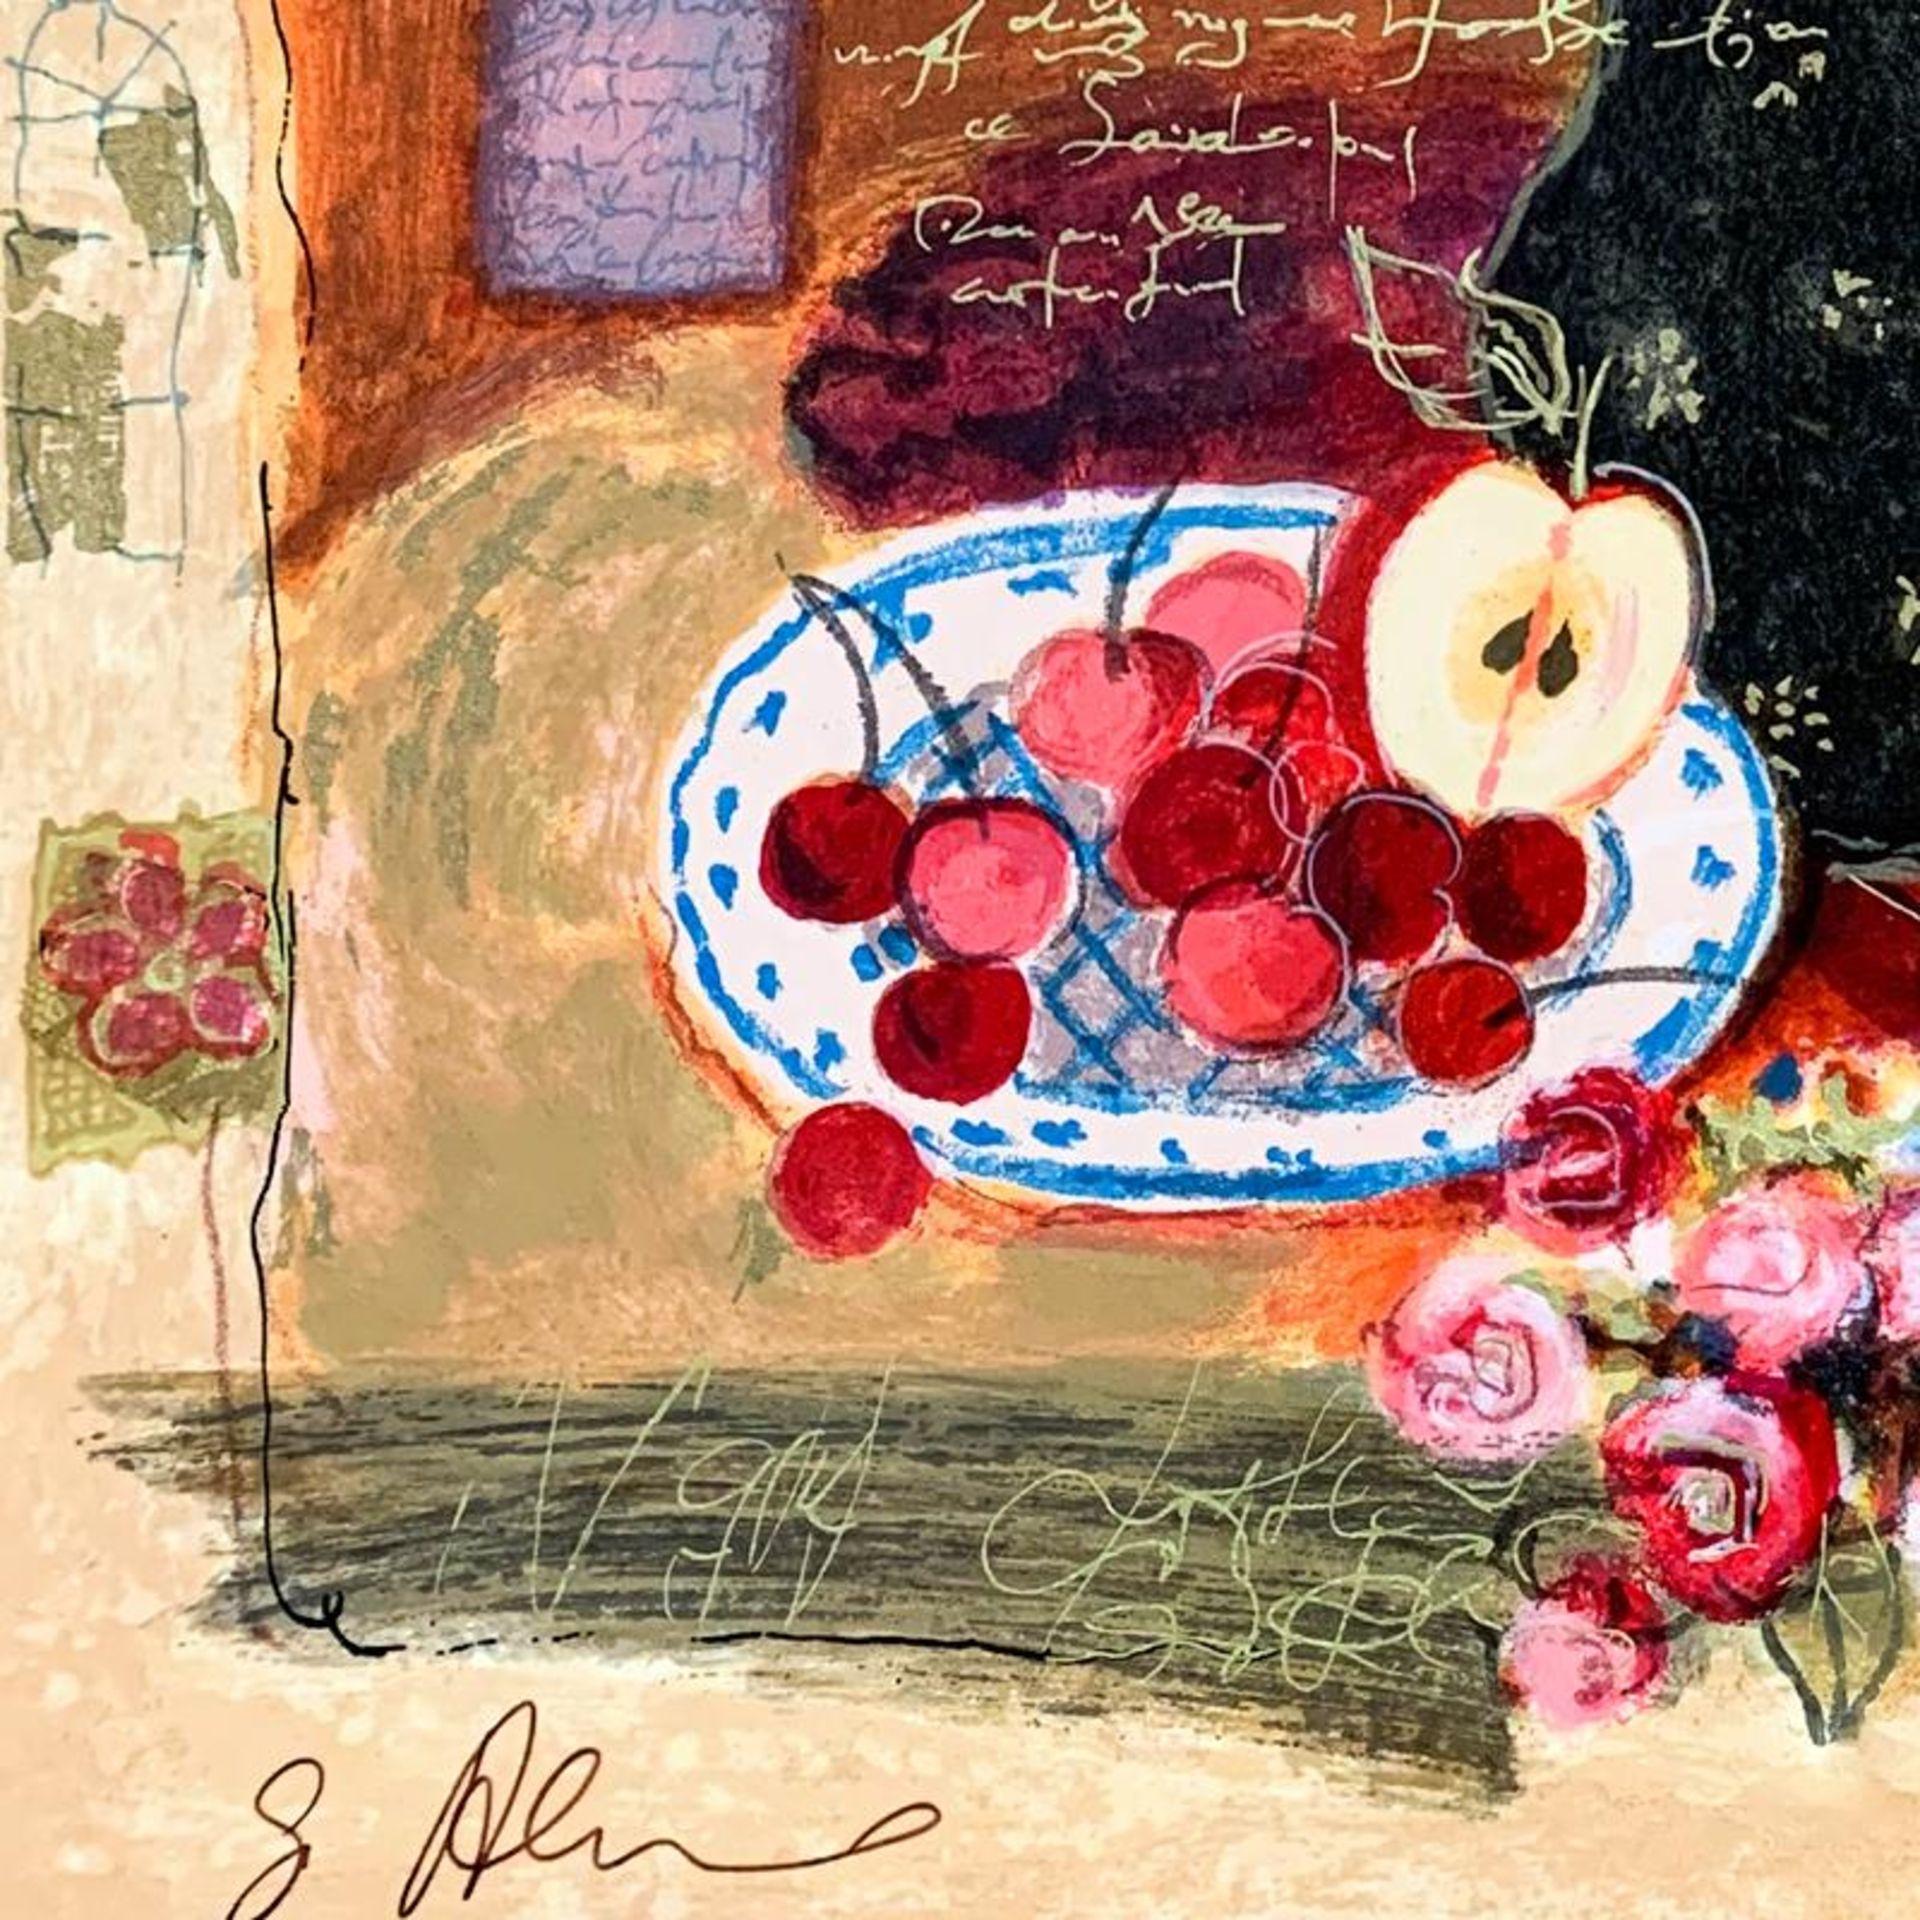 Flowers & Fruit II by Alexander & Wissotzky - Image 3 of 3